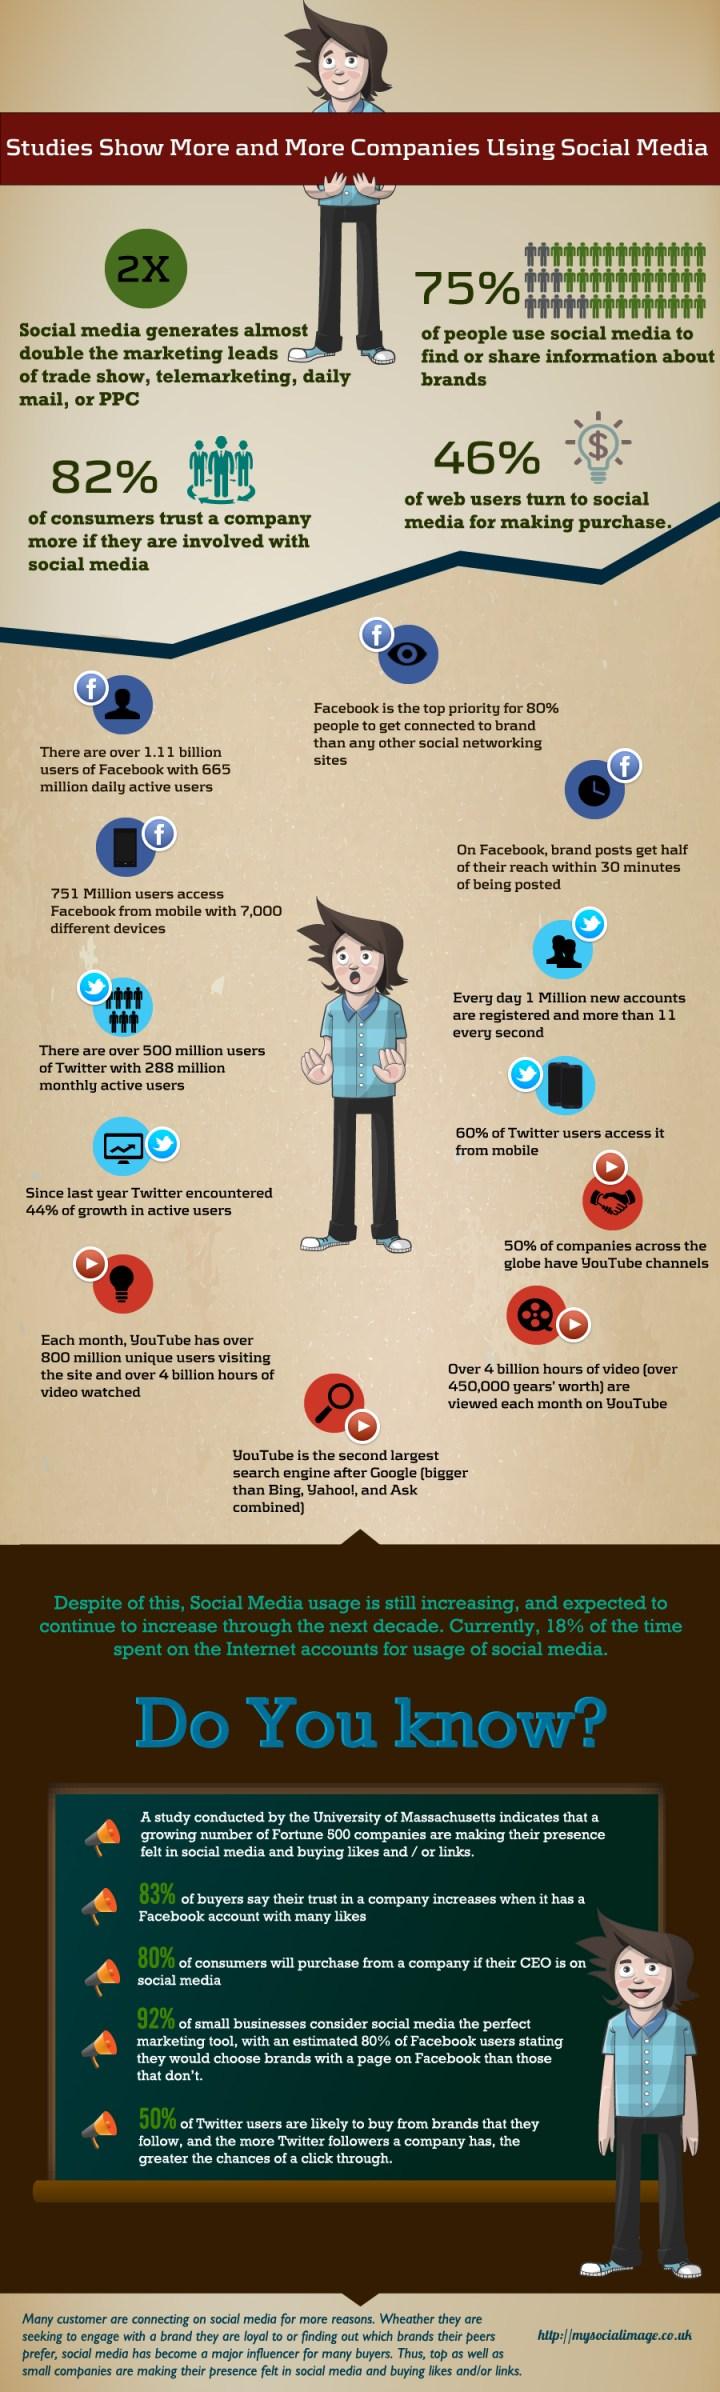 Immer mehr Unternehmen nutzen Social Media Infografik